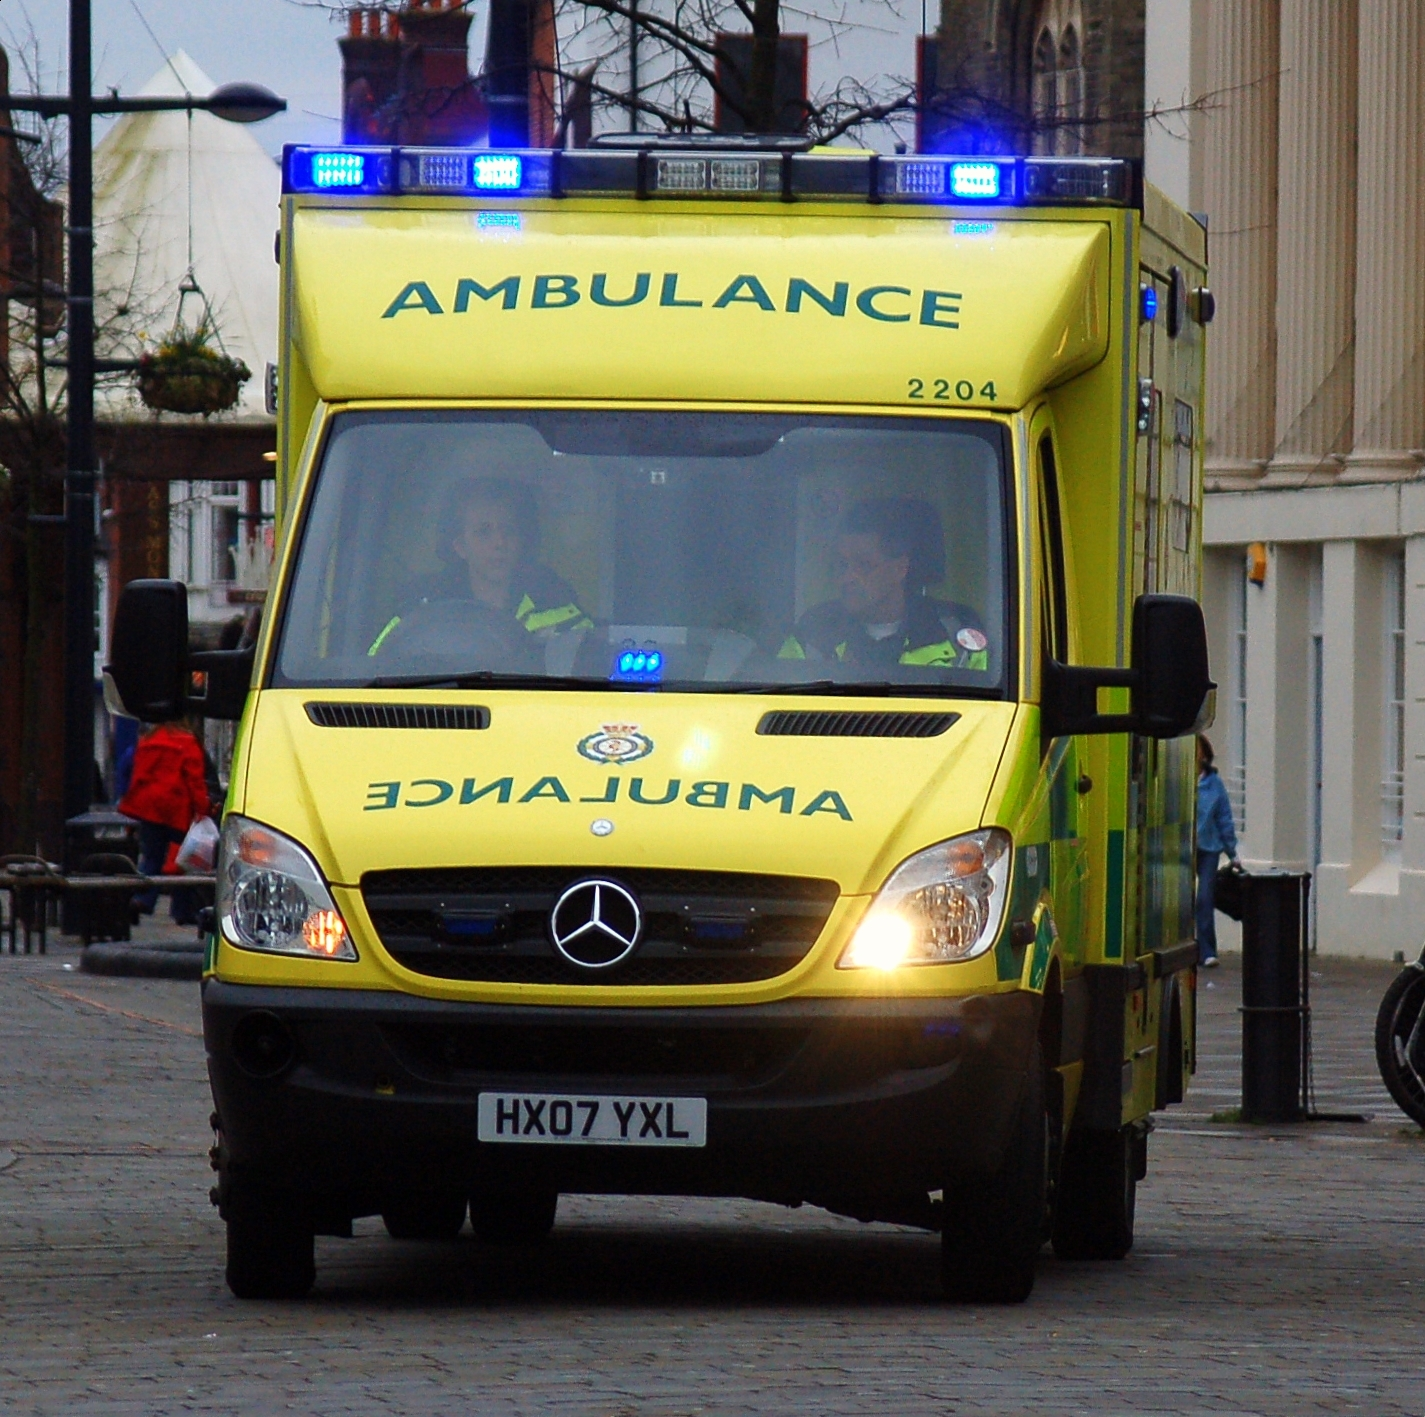 Ambulance with wig wag